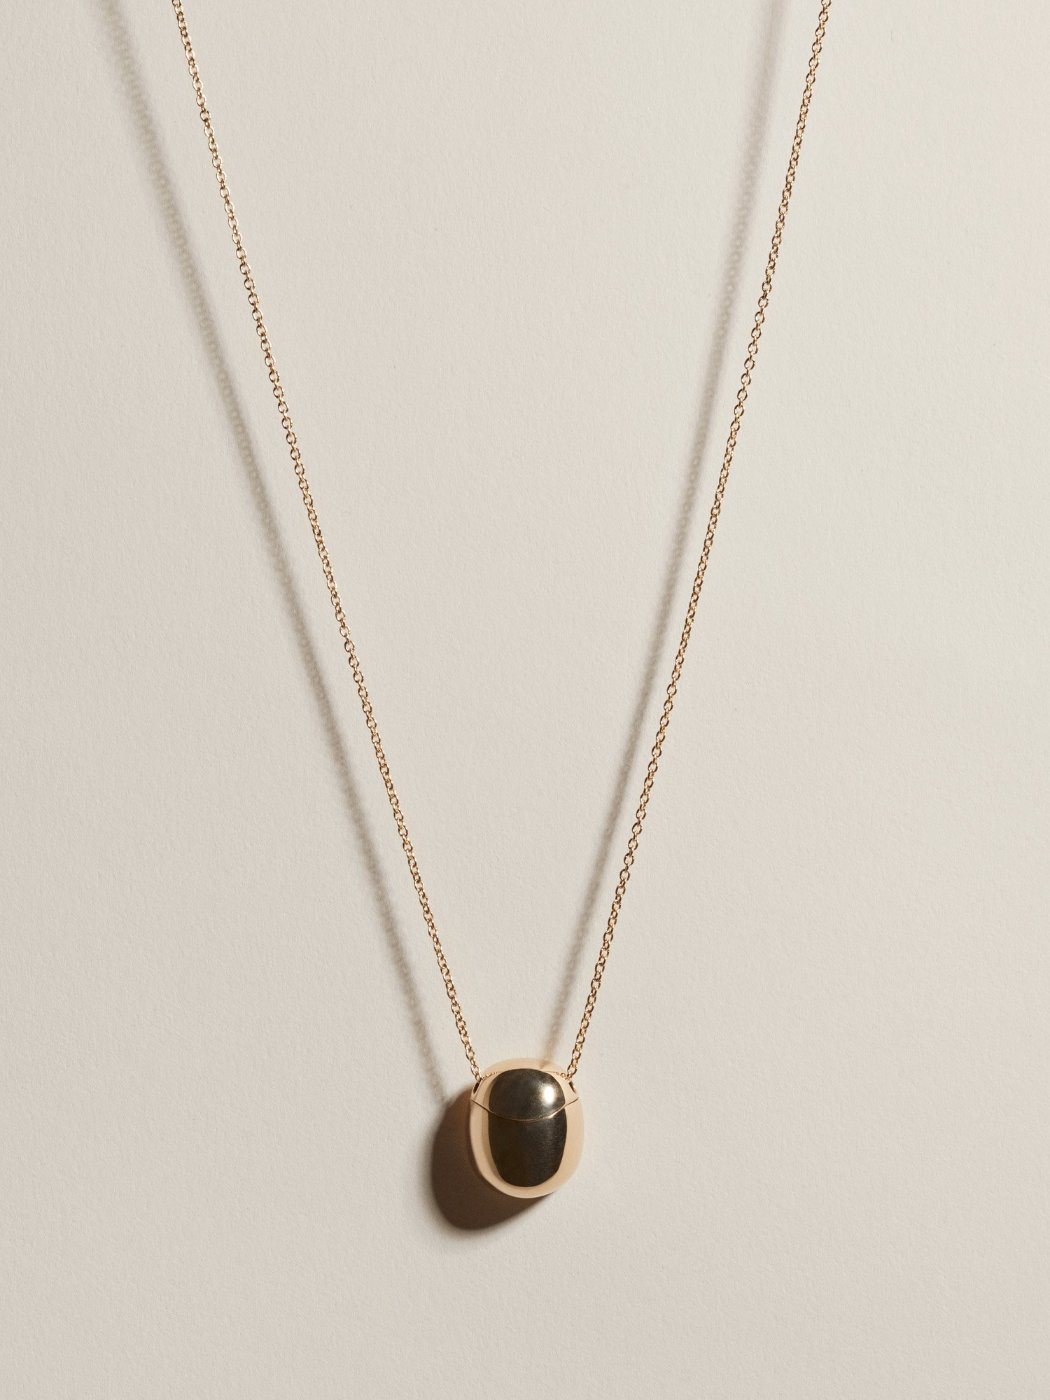 The newest JH arrival: a pendant for storing a secret memento